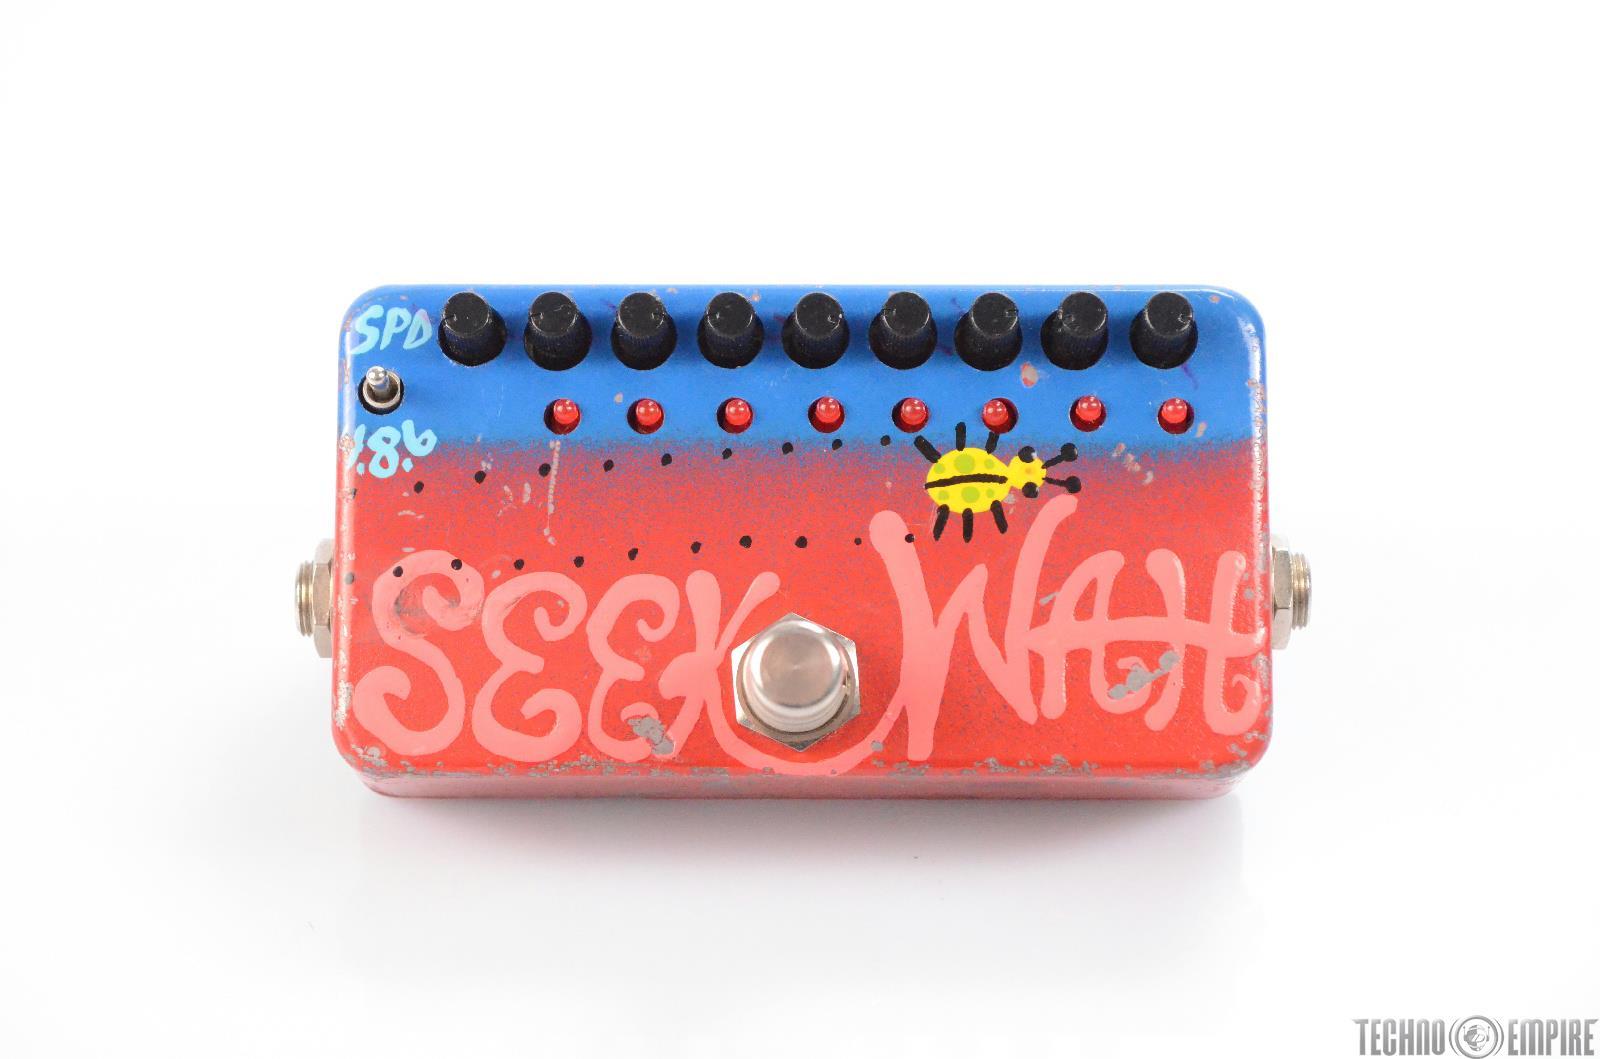 Zvex Seek Wah Effect Guitar Pedal Owned by Matt Hyde #30152